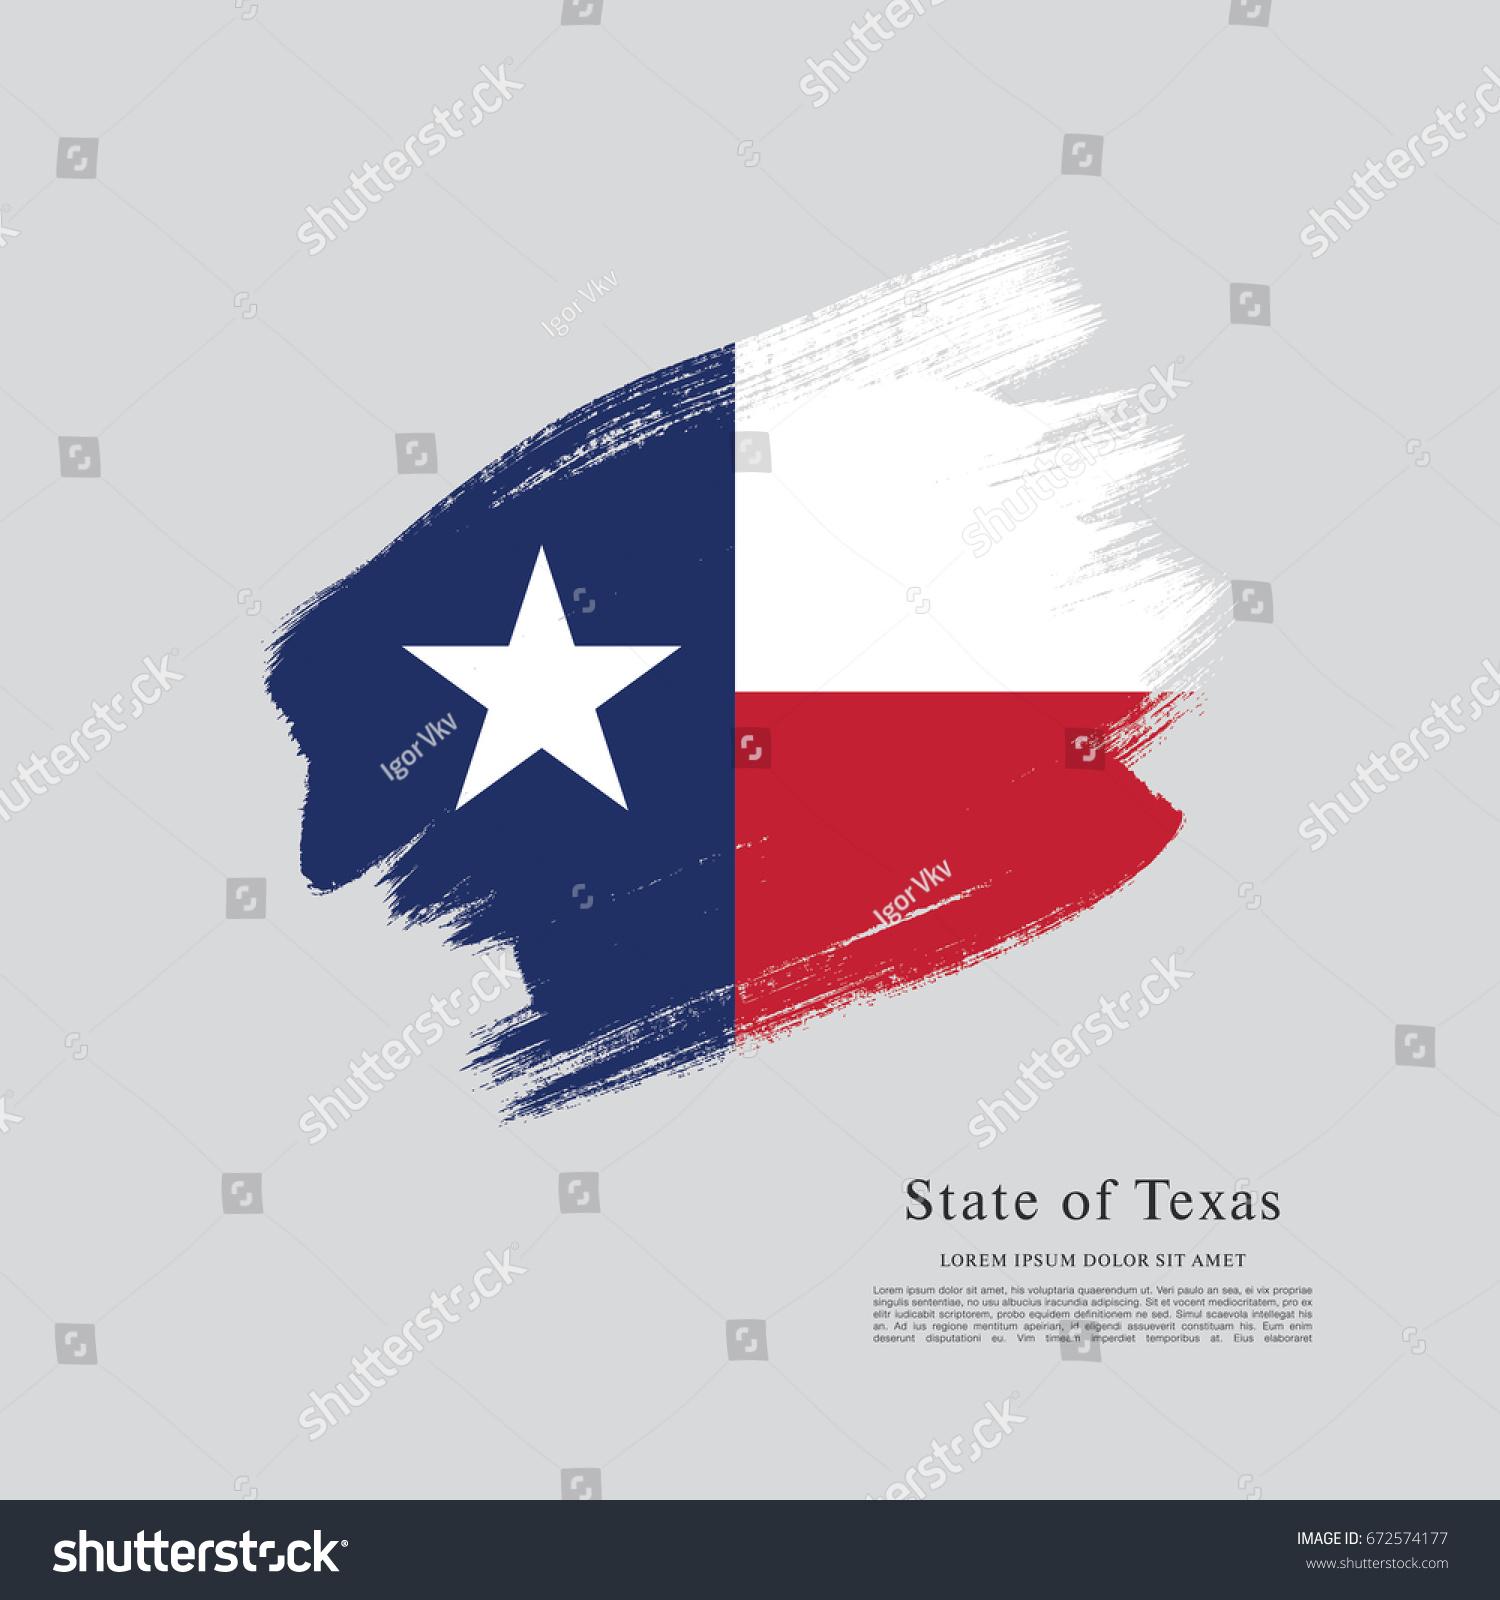 Flag Texas United States America Vector de stock672574177: Shutterstock